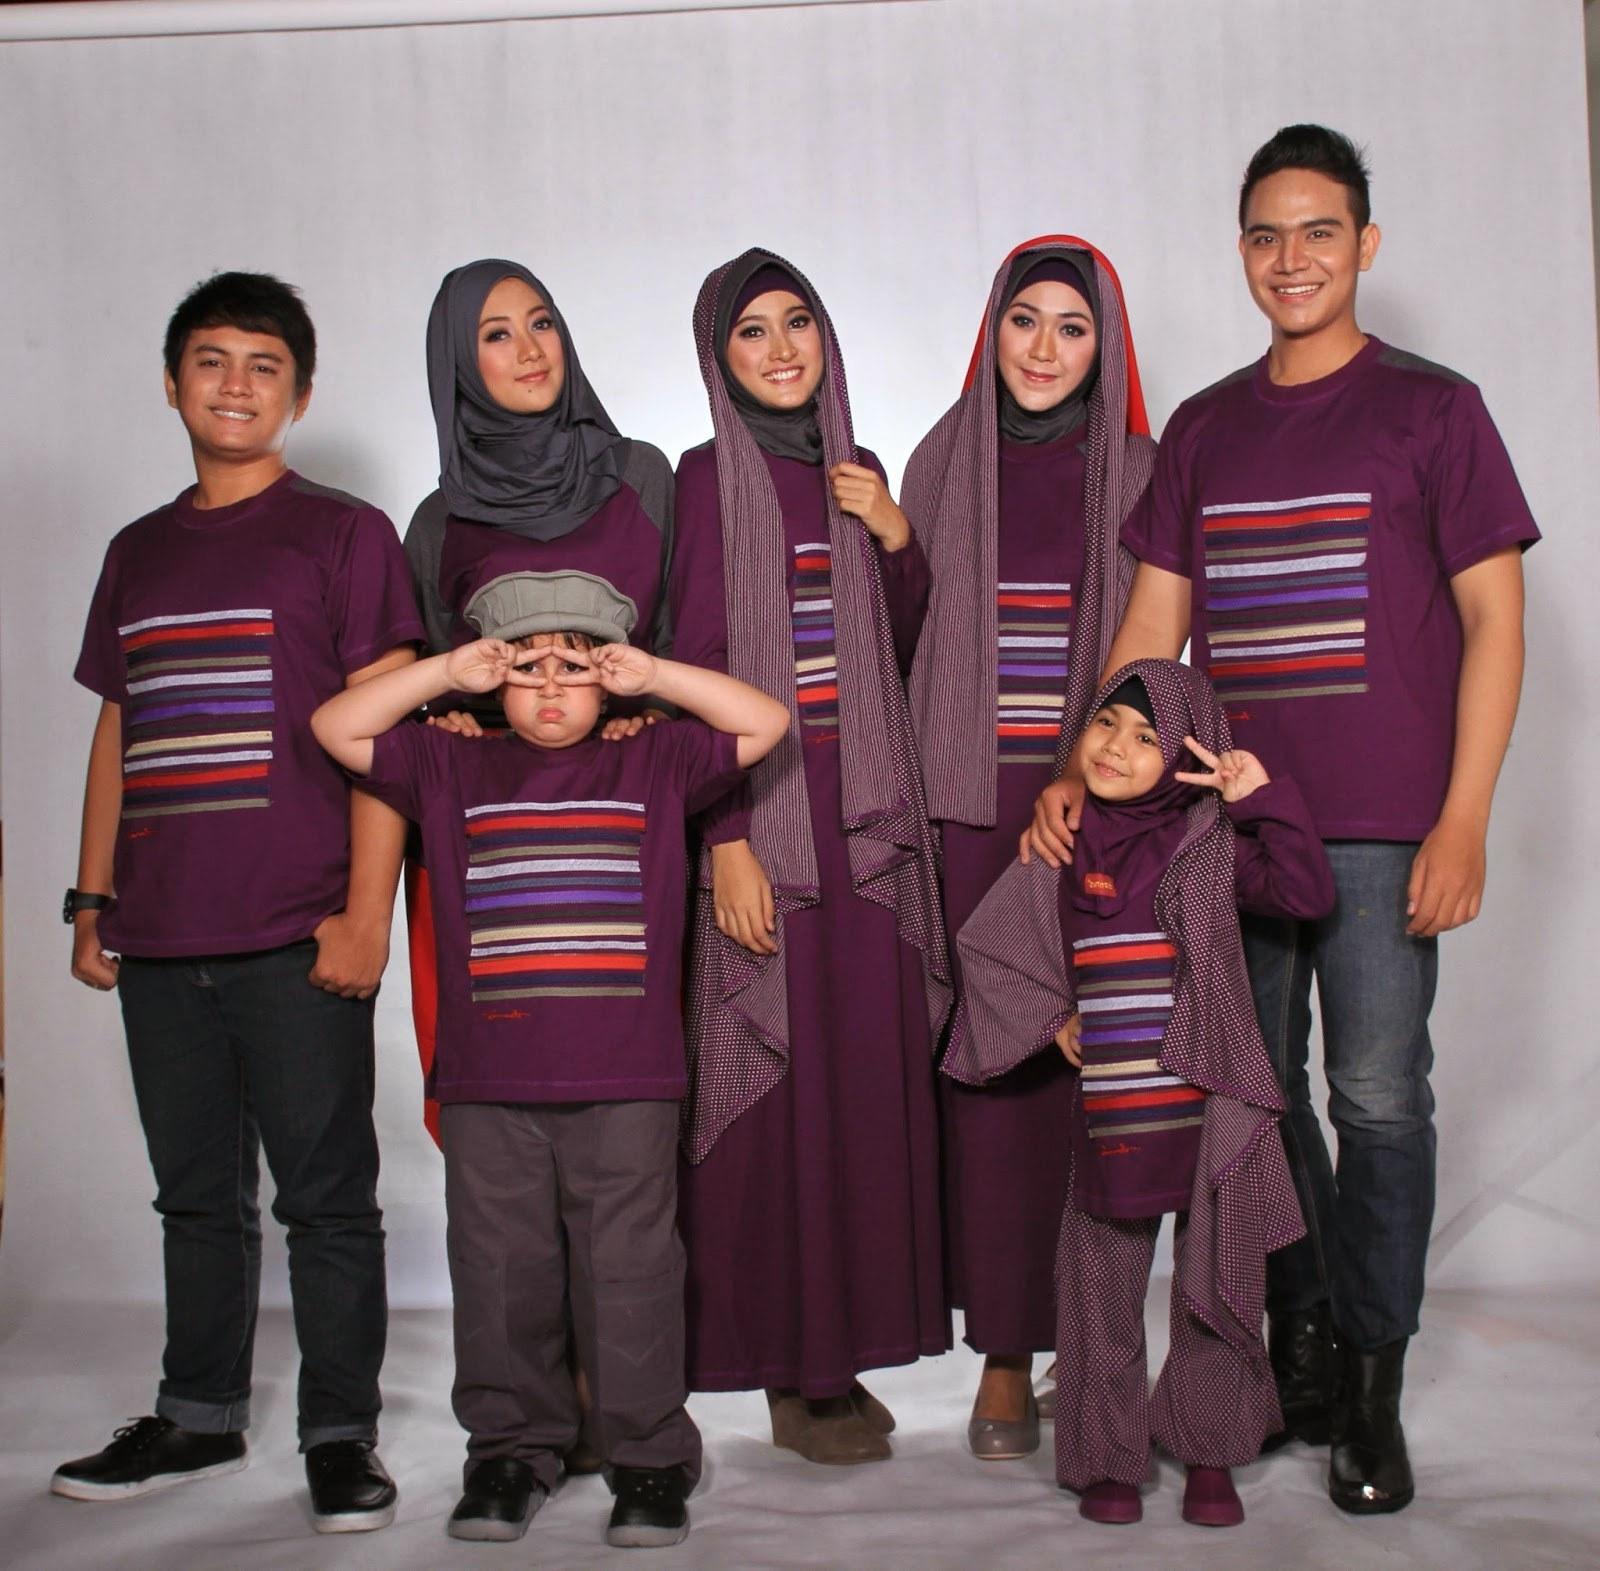 Inspirasi Model Baju Lebaran 2018 Anak Whdr Model Baju Keluarga Untuk Hari Raya Lebaran 2018